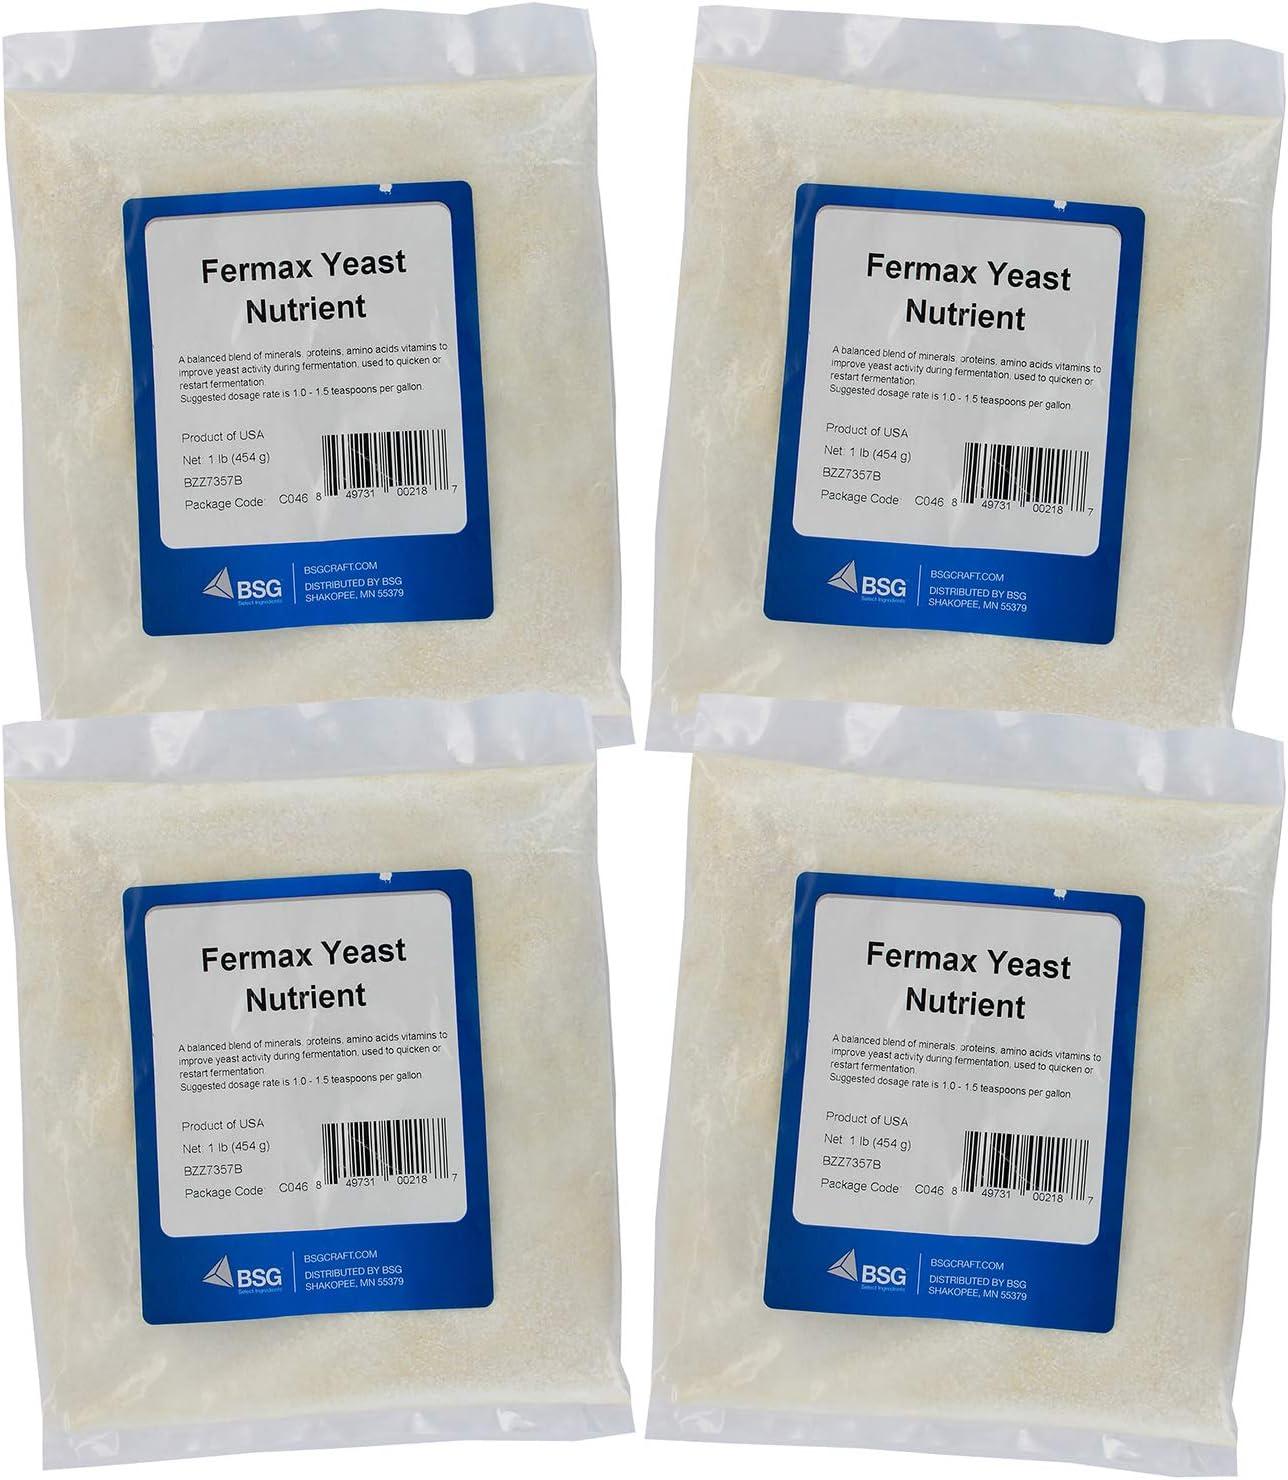 F ur Pa k Fermax Yeast Nutrient 1lb Home Brewing Starter Sets ...